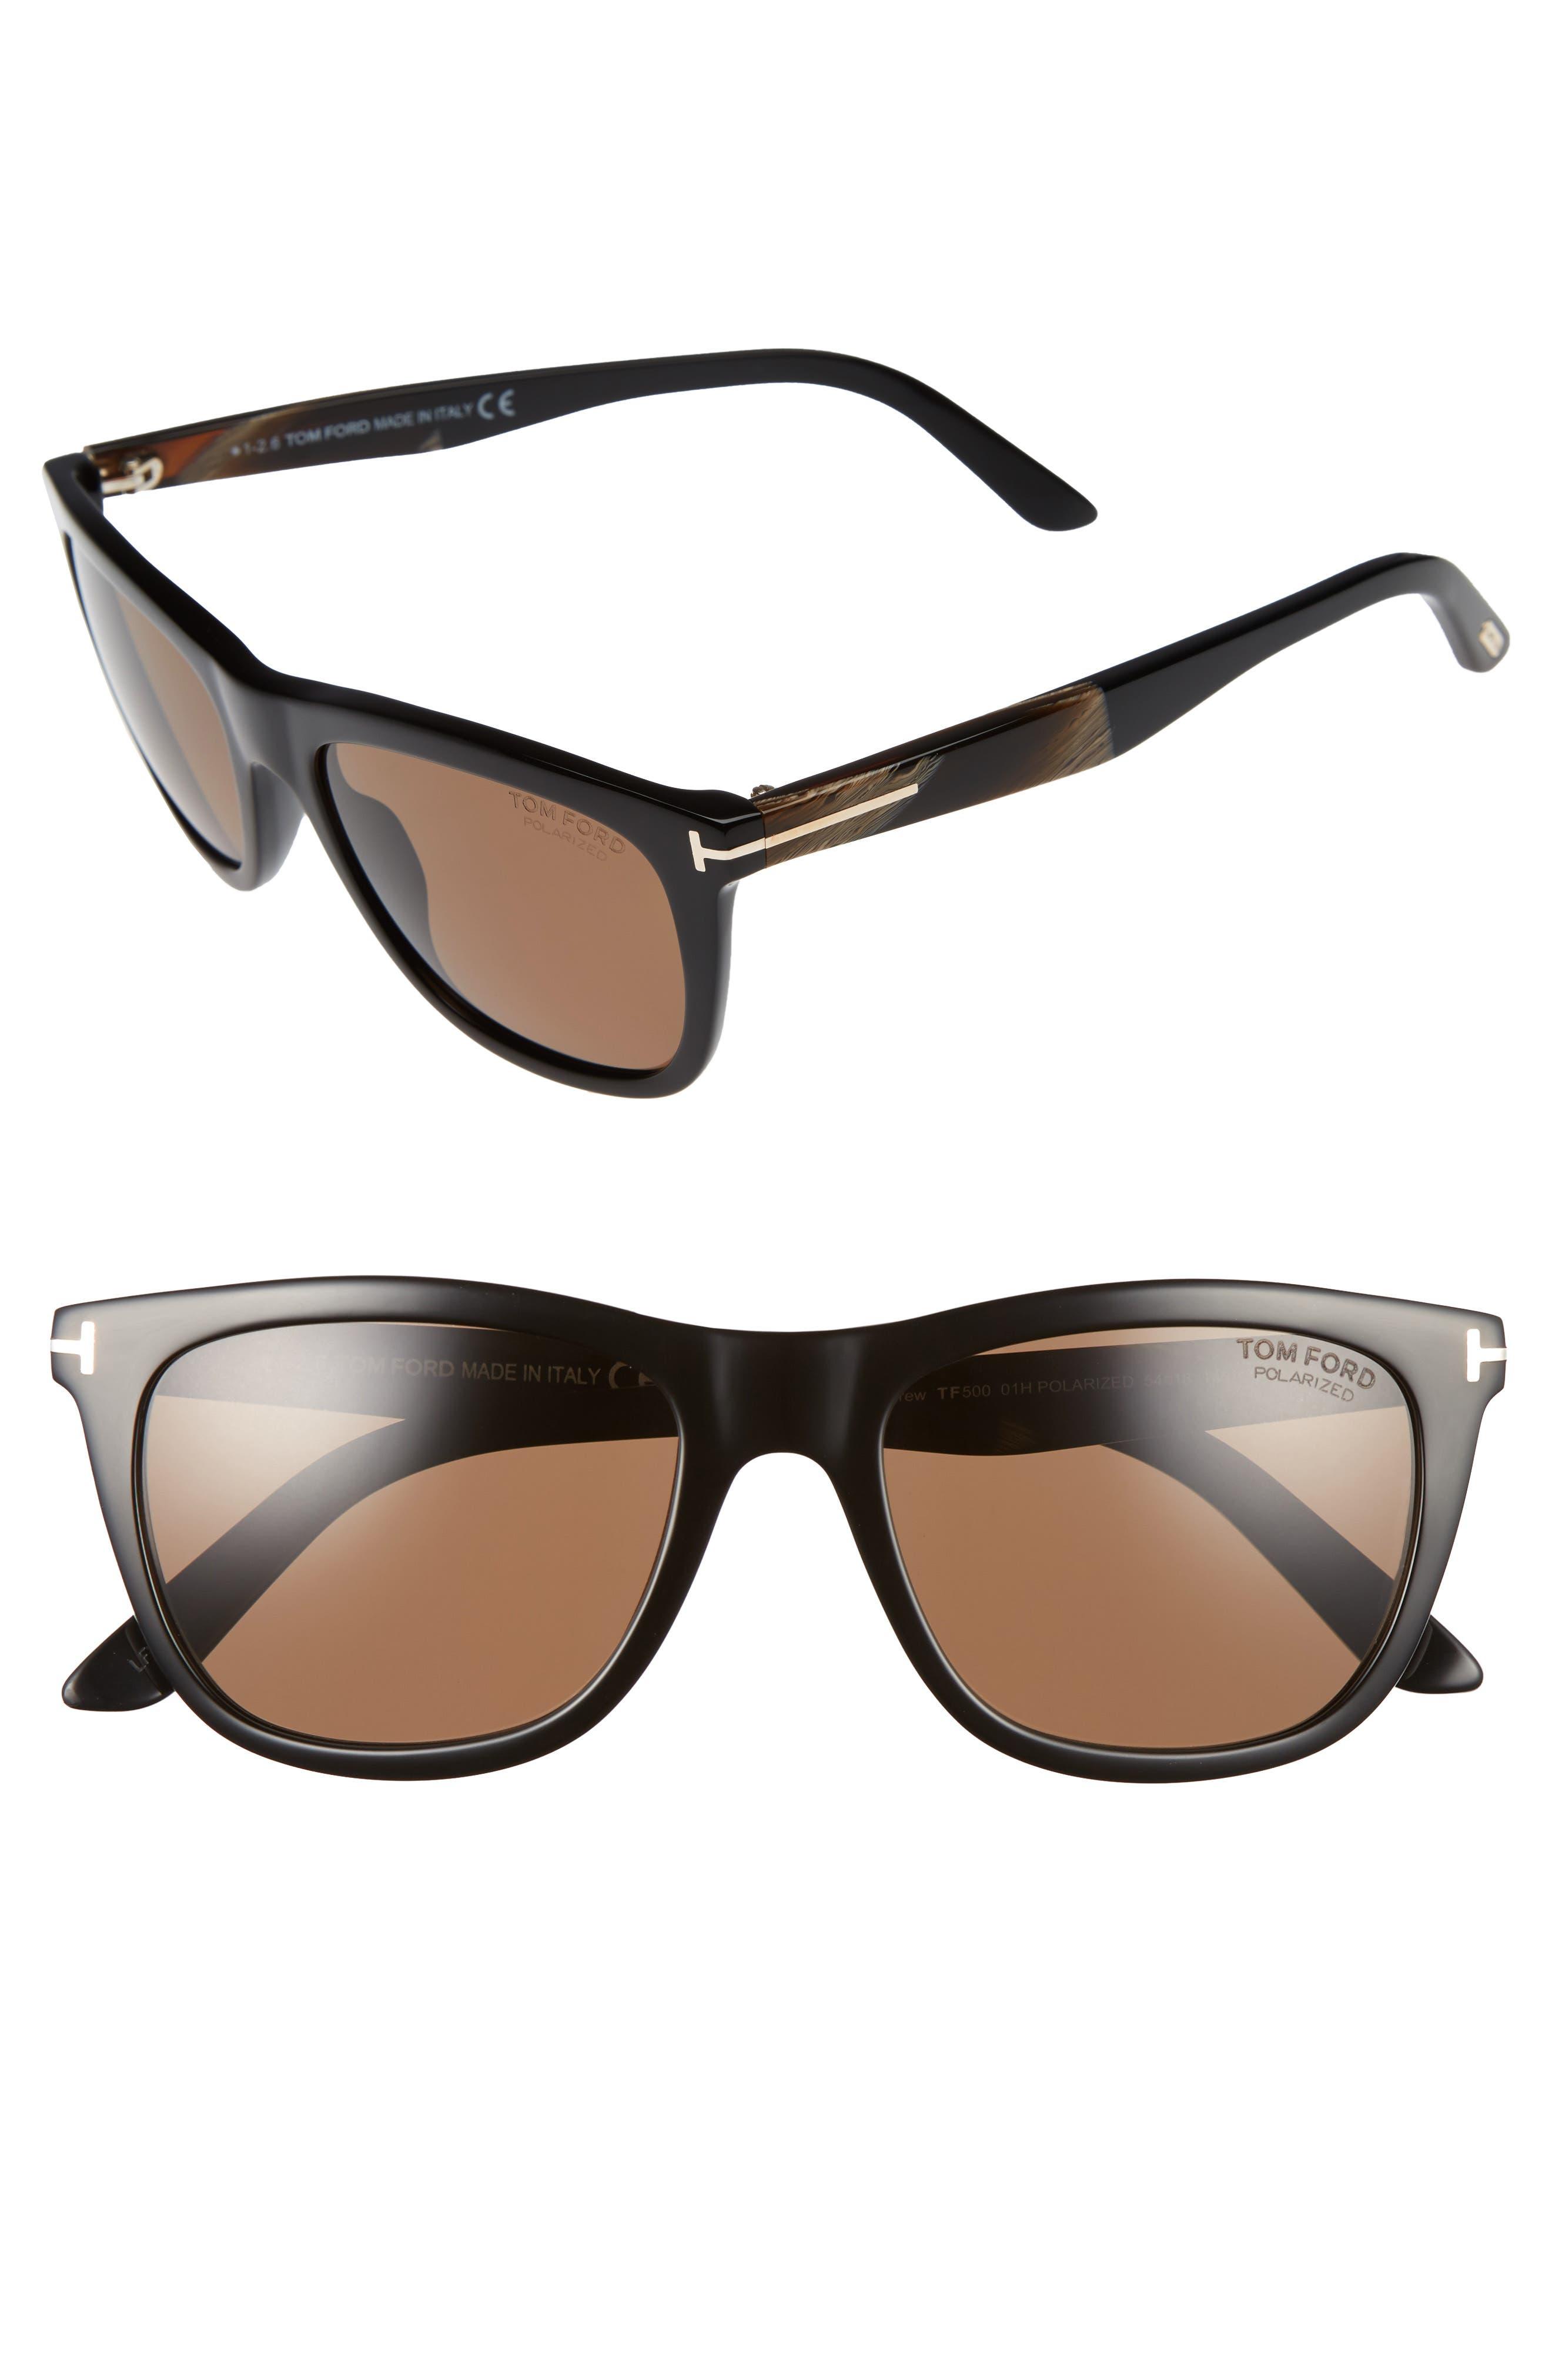 Andrew 54mm Sunglasses,                             Alternate thumbnail 2, color,                             001